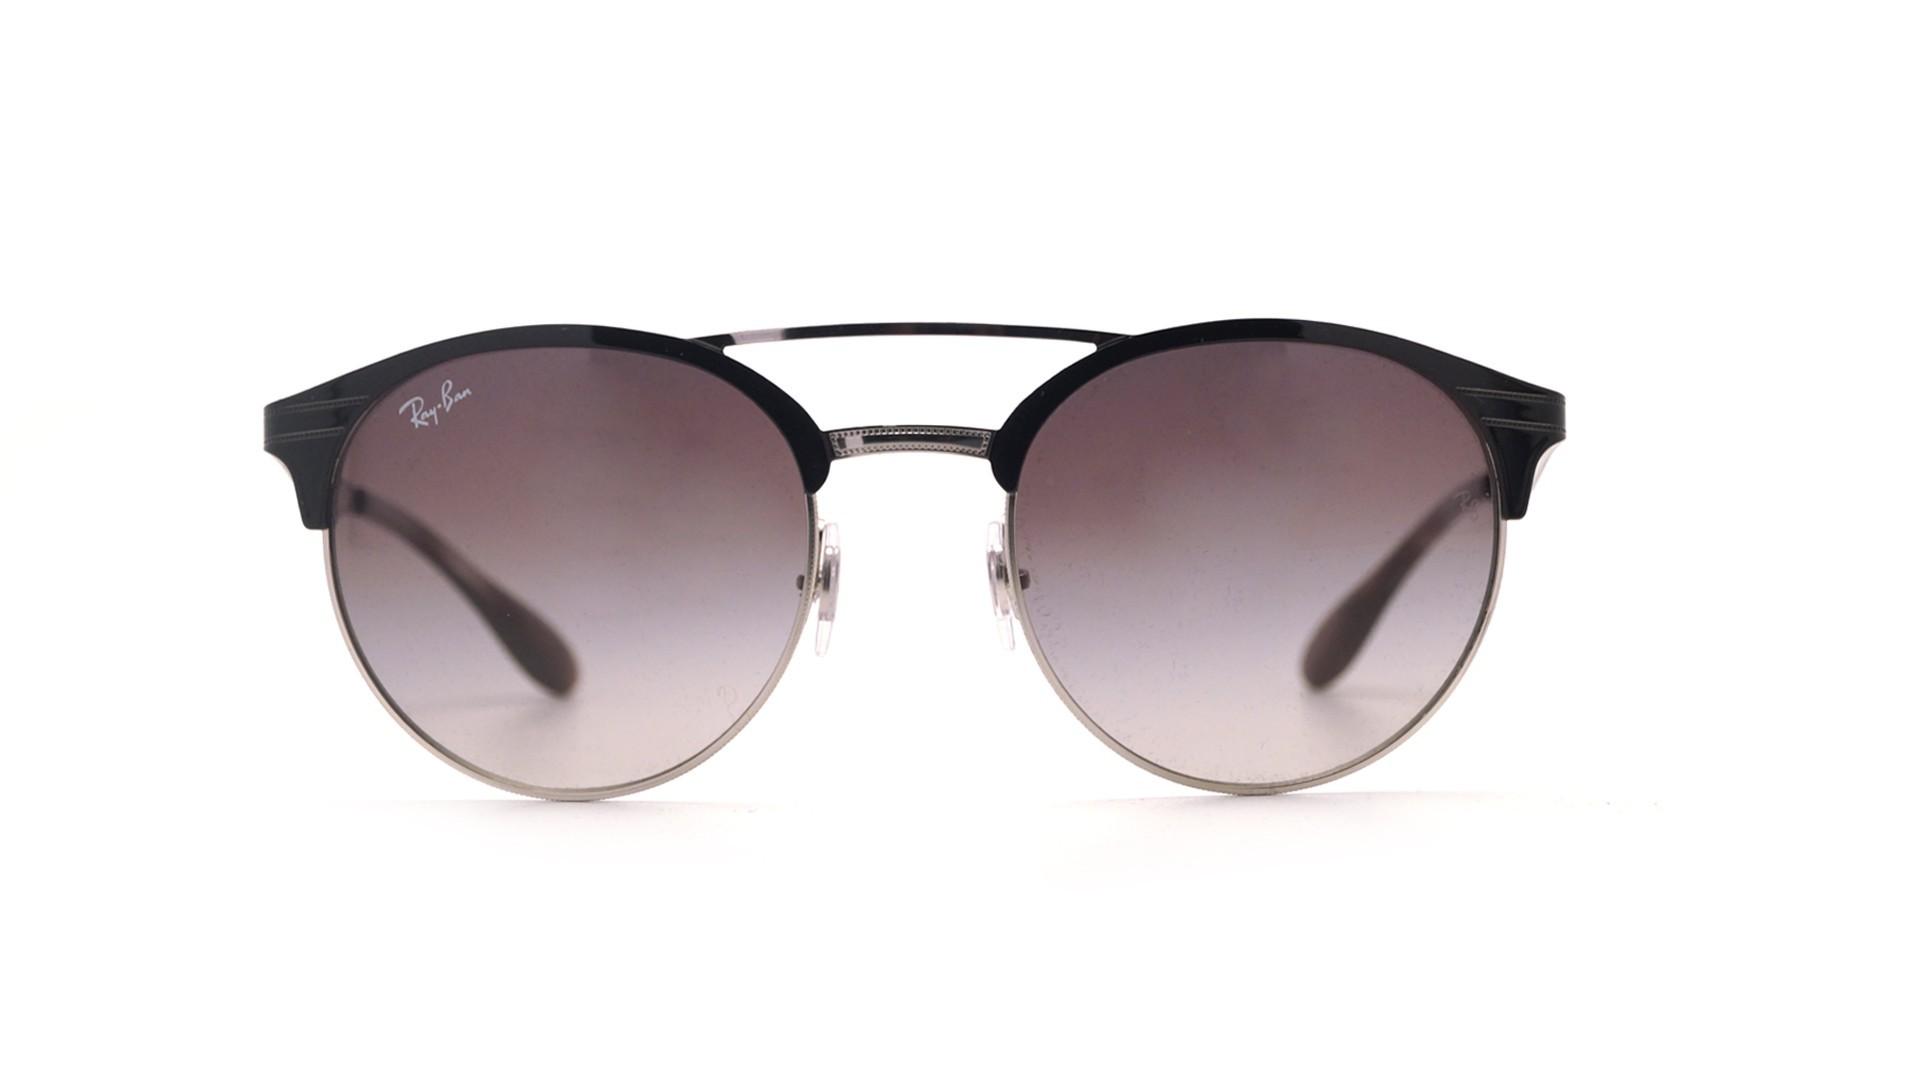 f2db87274b4 Sunglasses Ray-Ban RB3545 9004 11 54-20 Black Medium Gradient